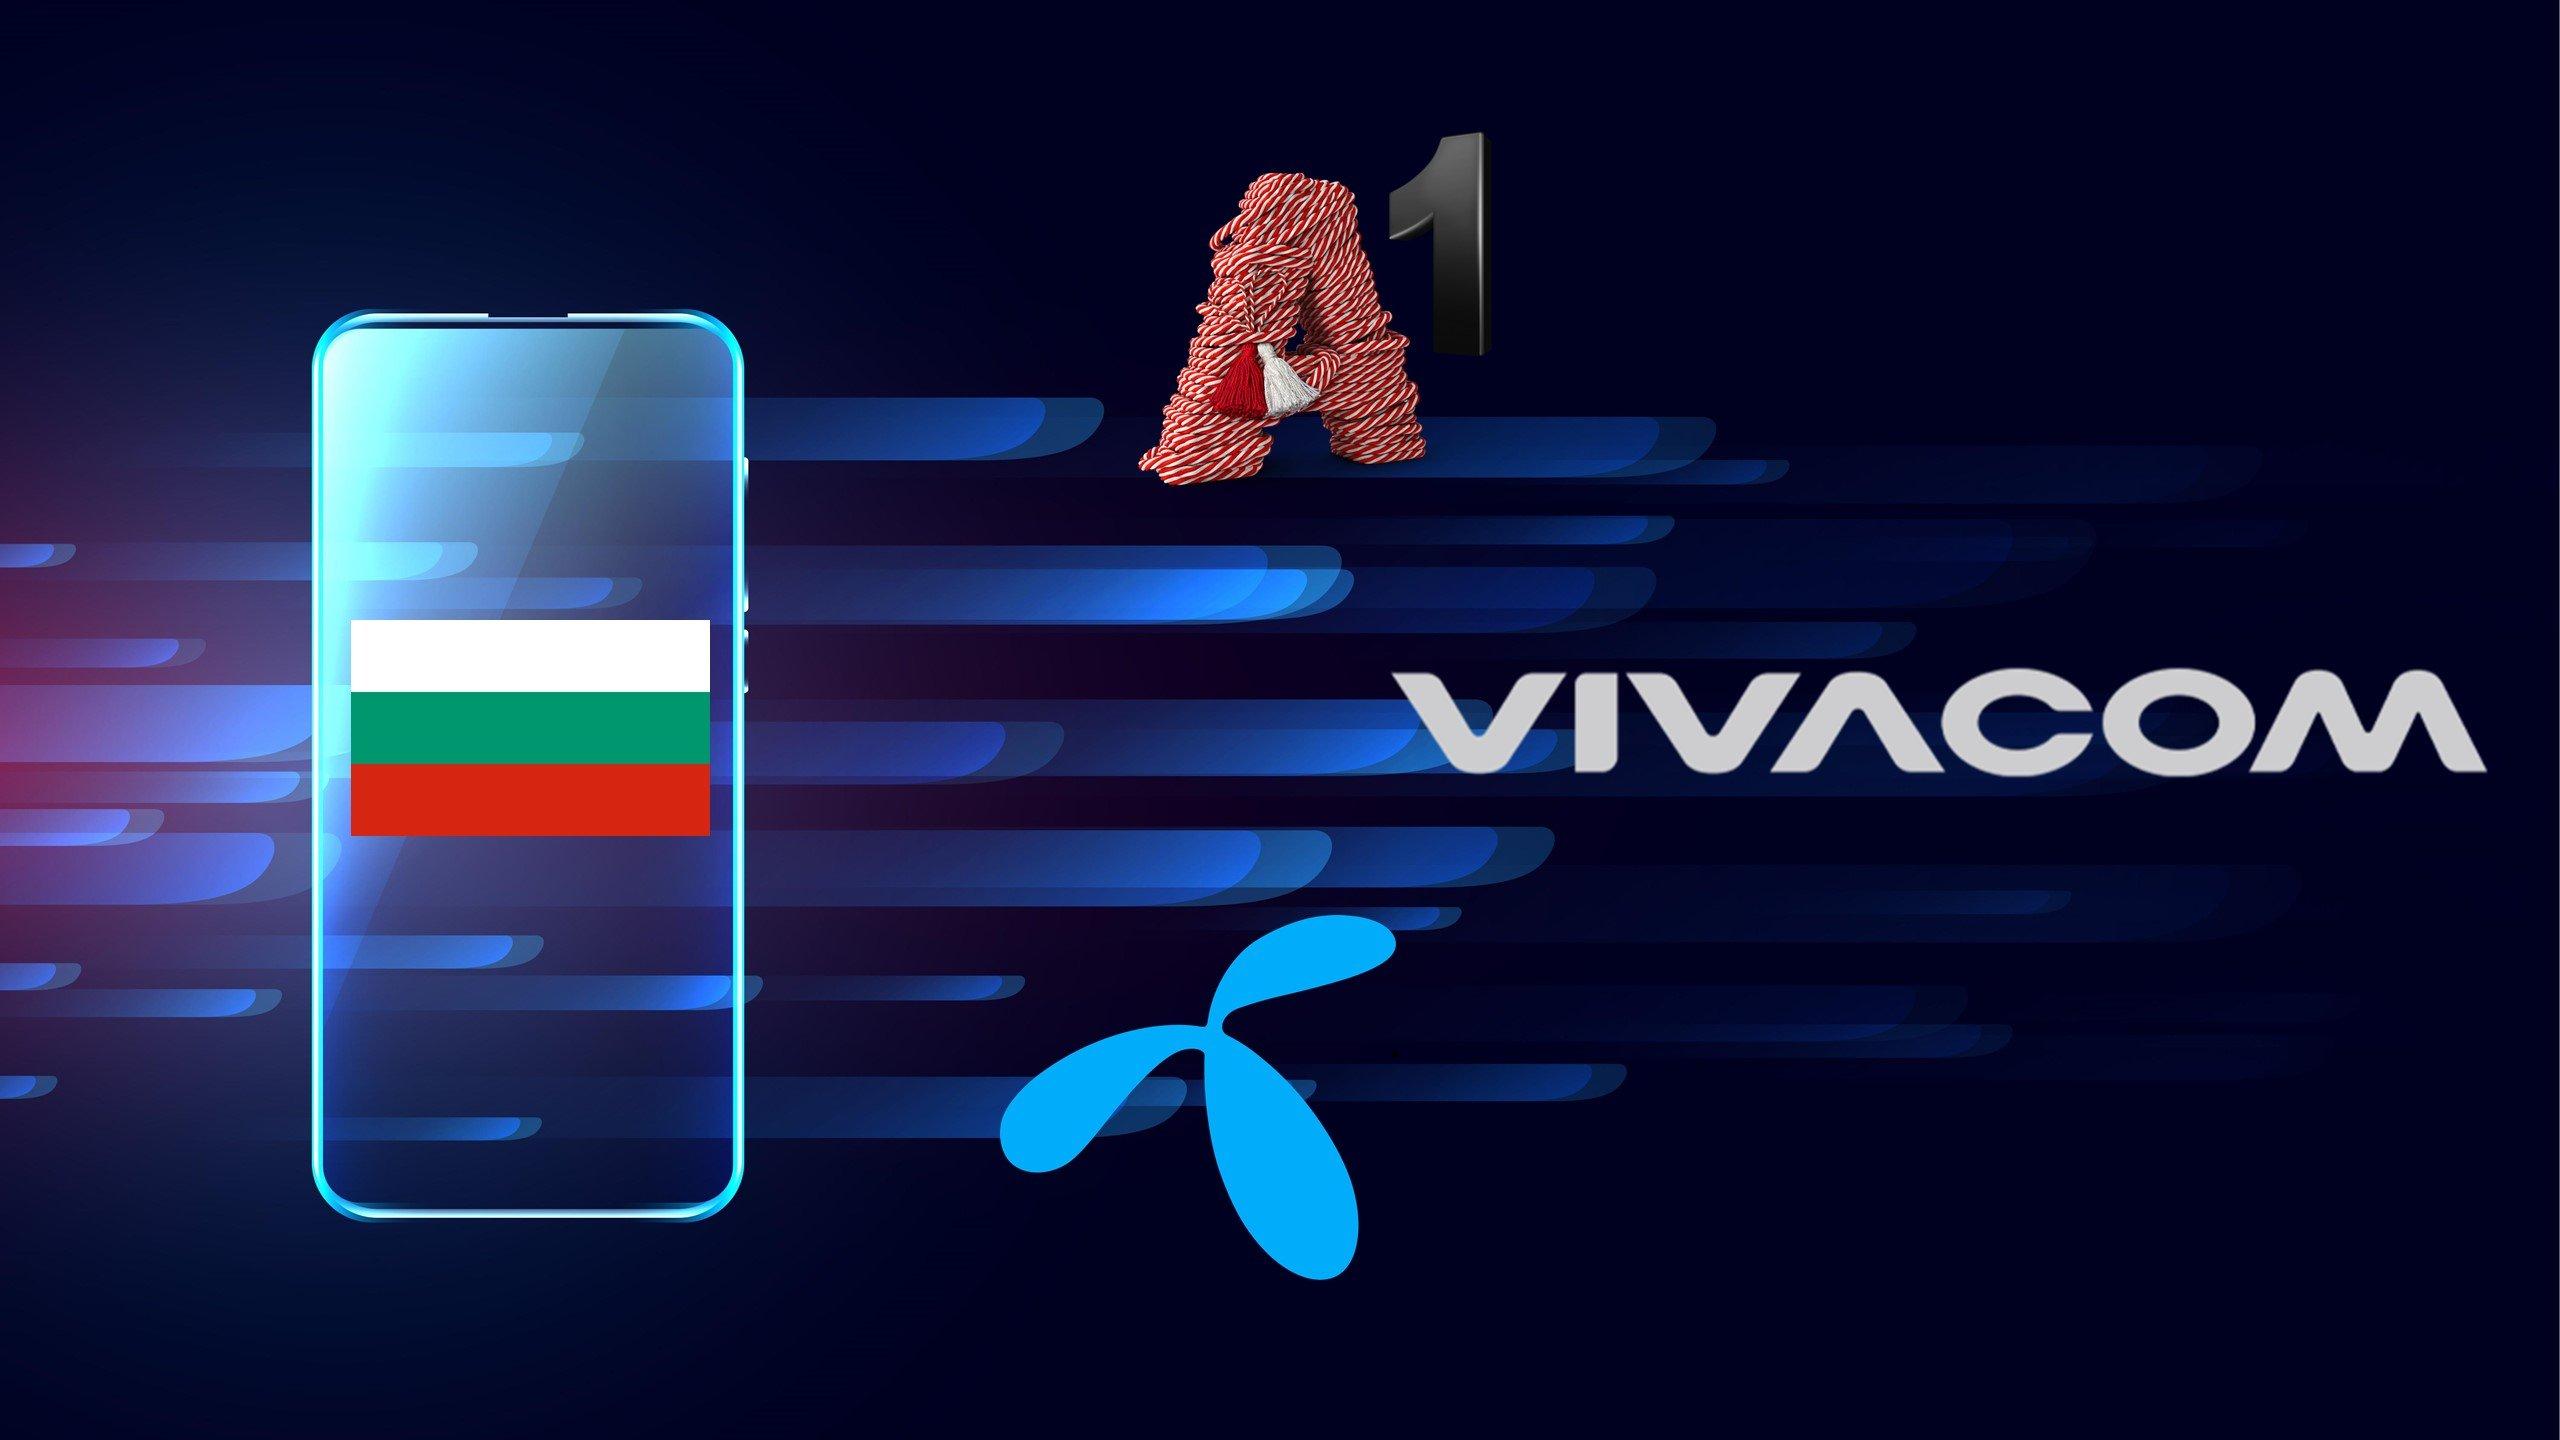 tarrif-wars-bulgaria-telecom